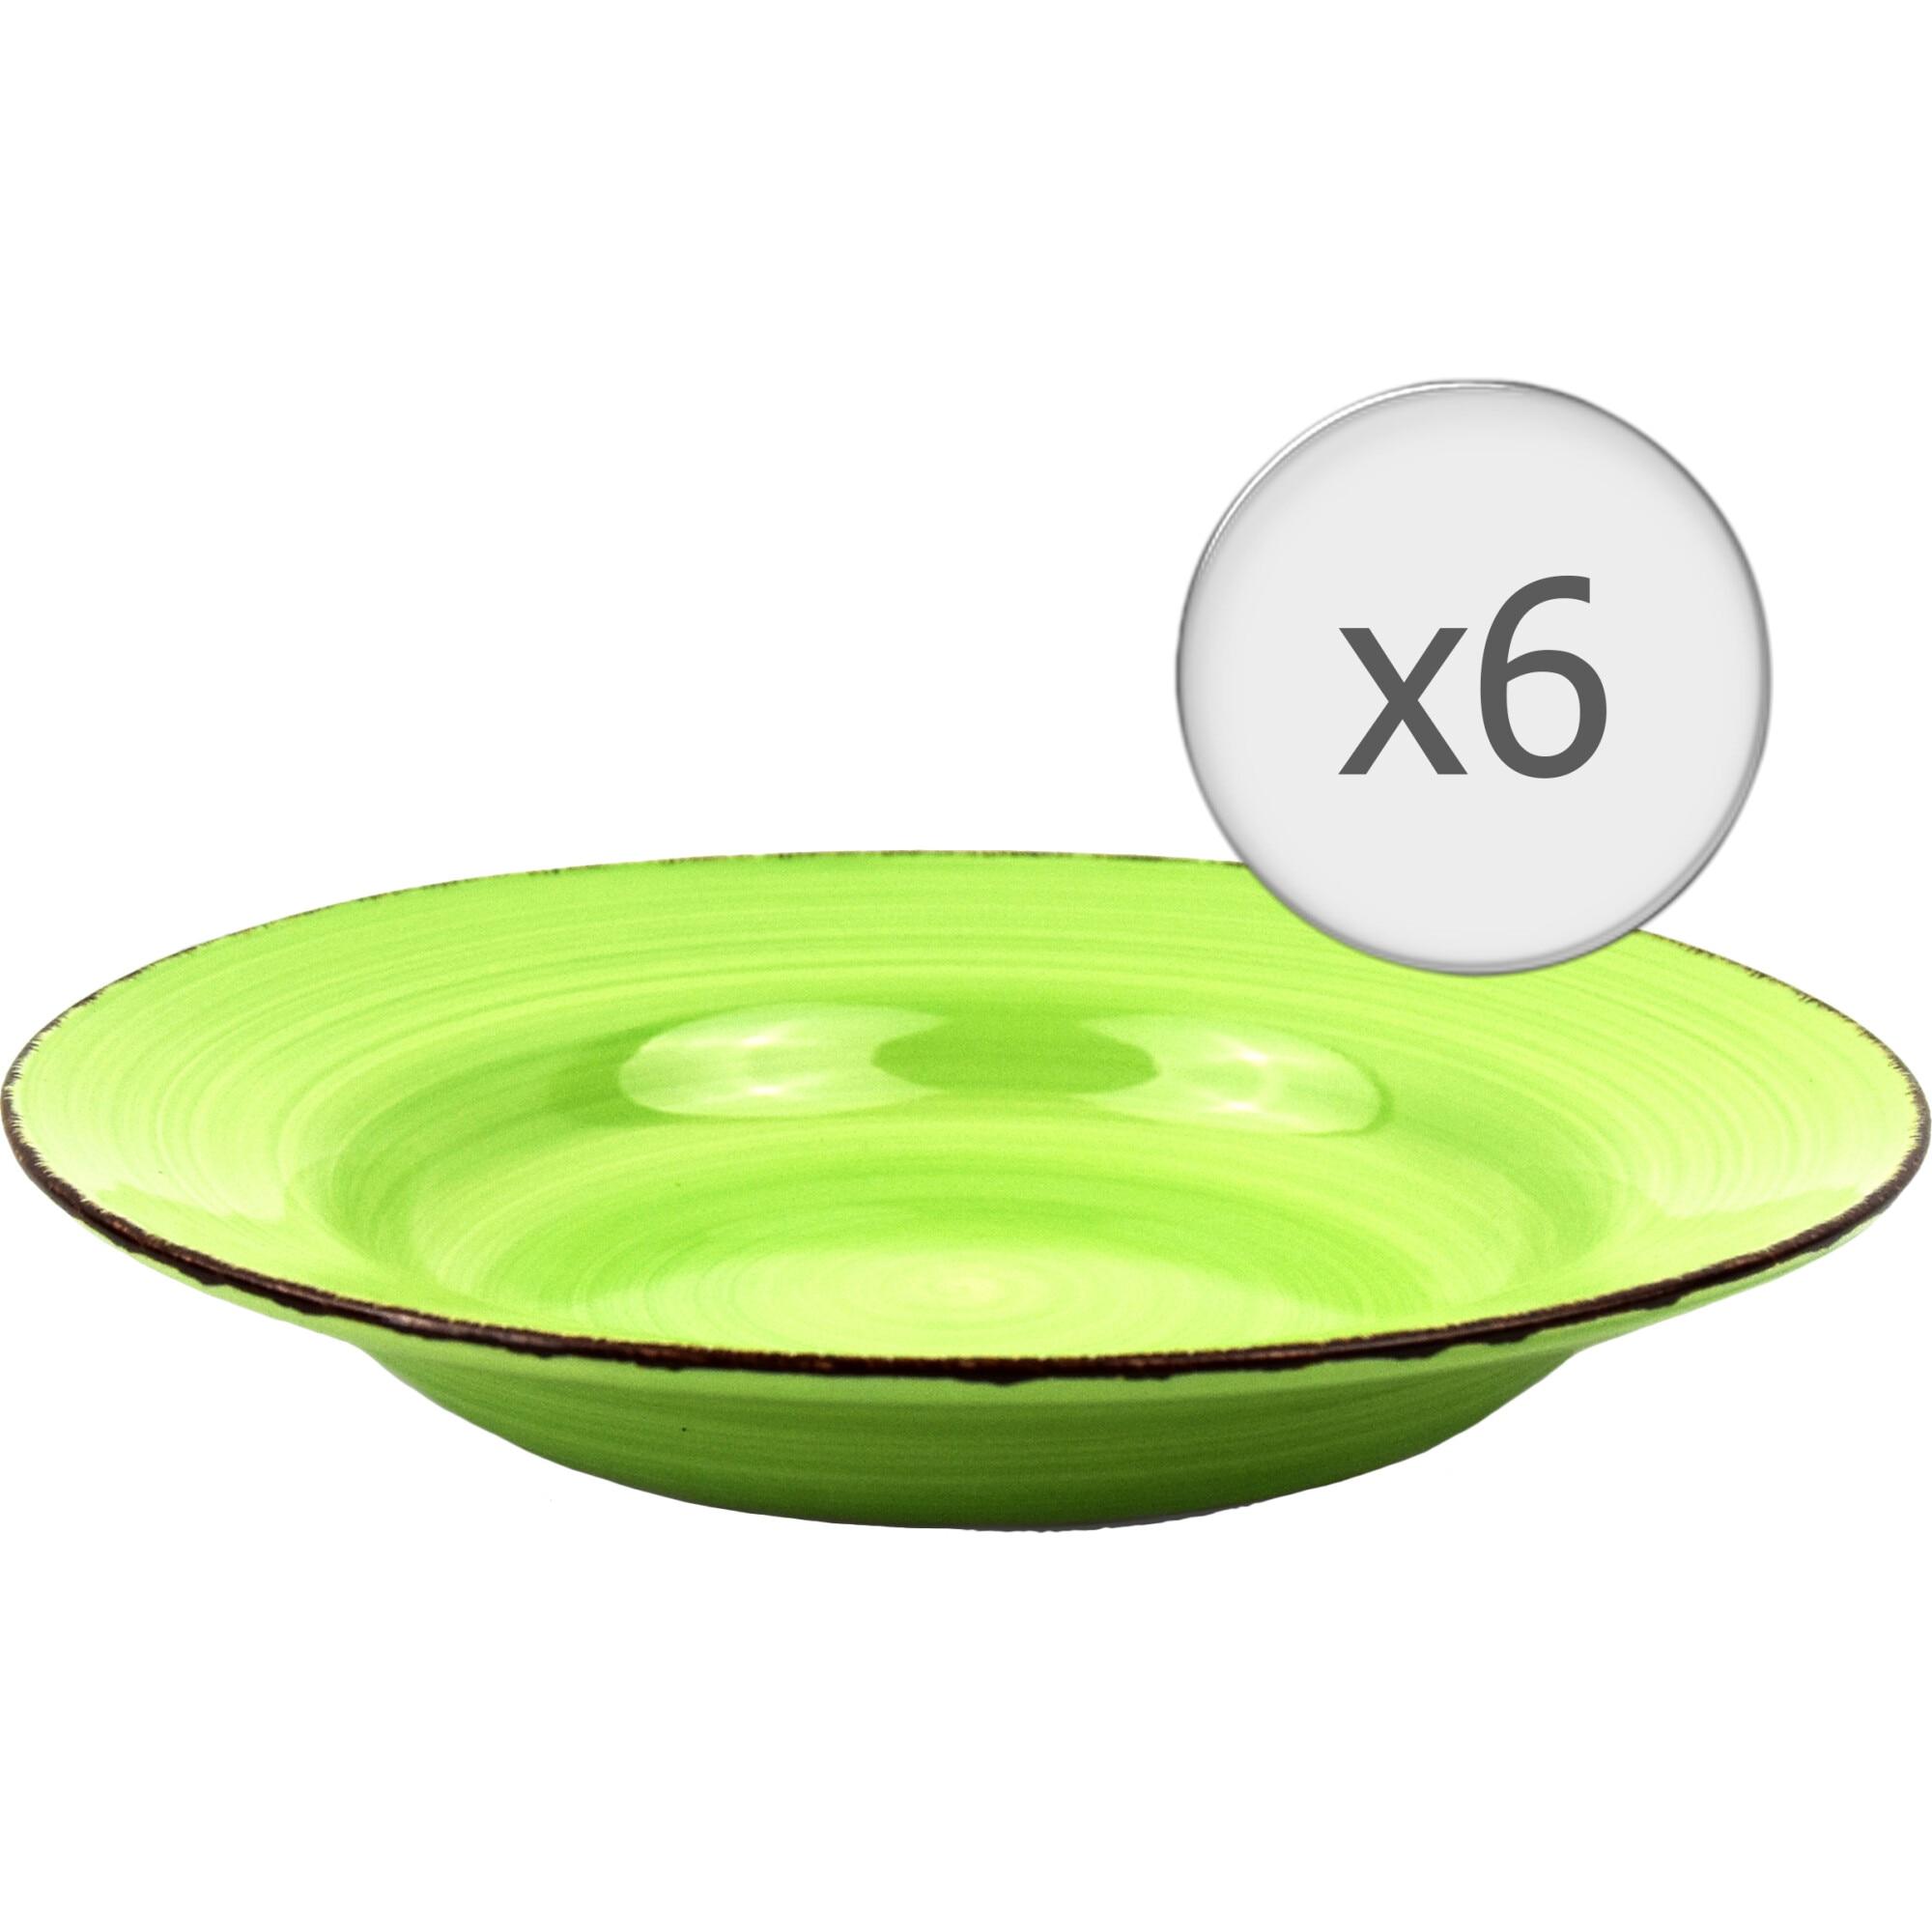 Fotografie Set 6 farfurii pentru paste Art of dining by HEINNER Gala, ceramica, 22 cm, verde